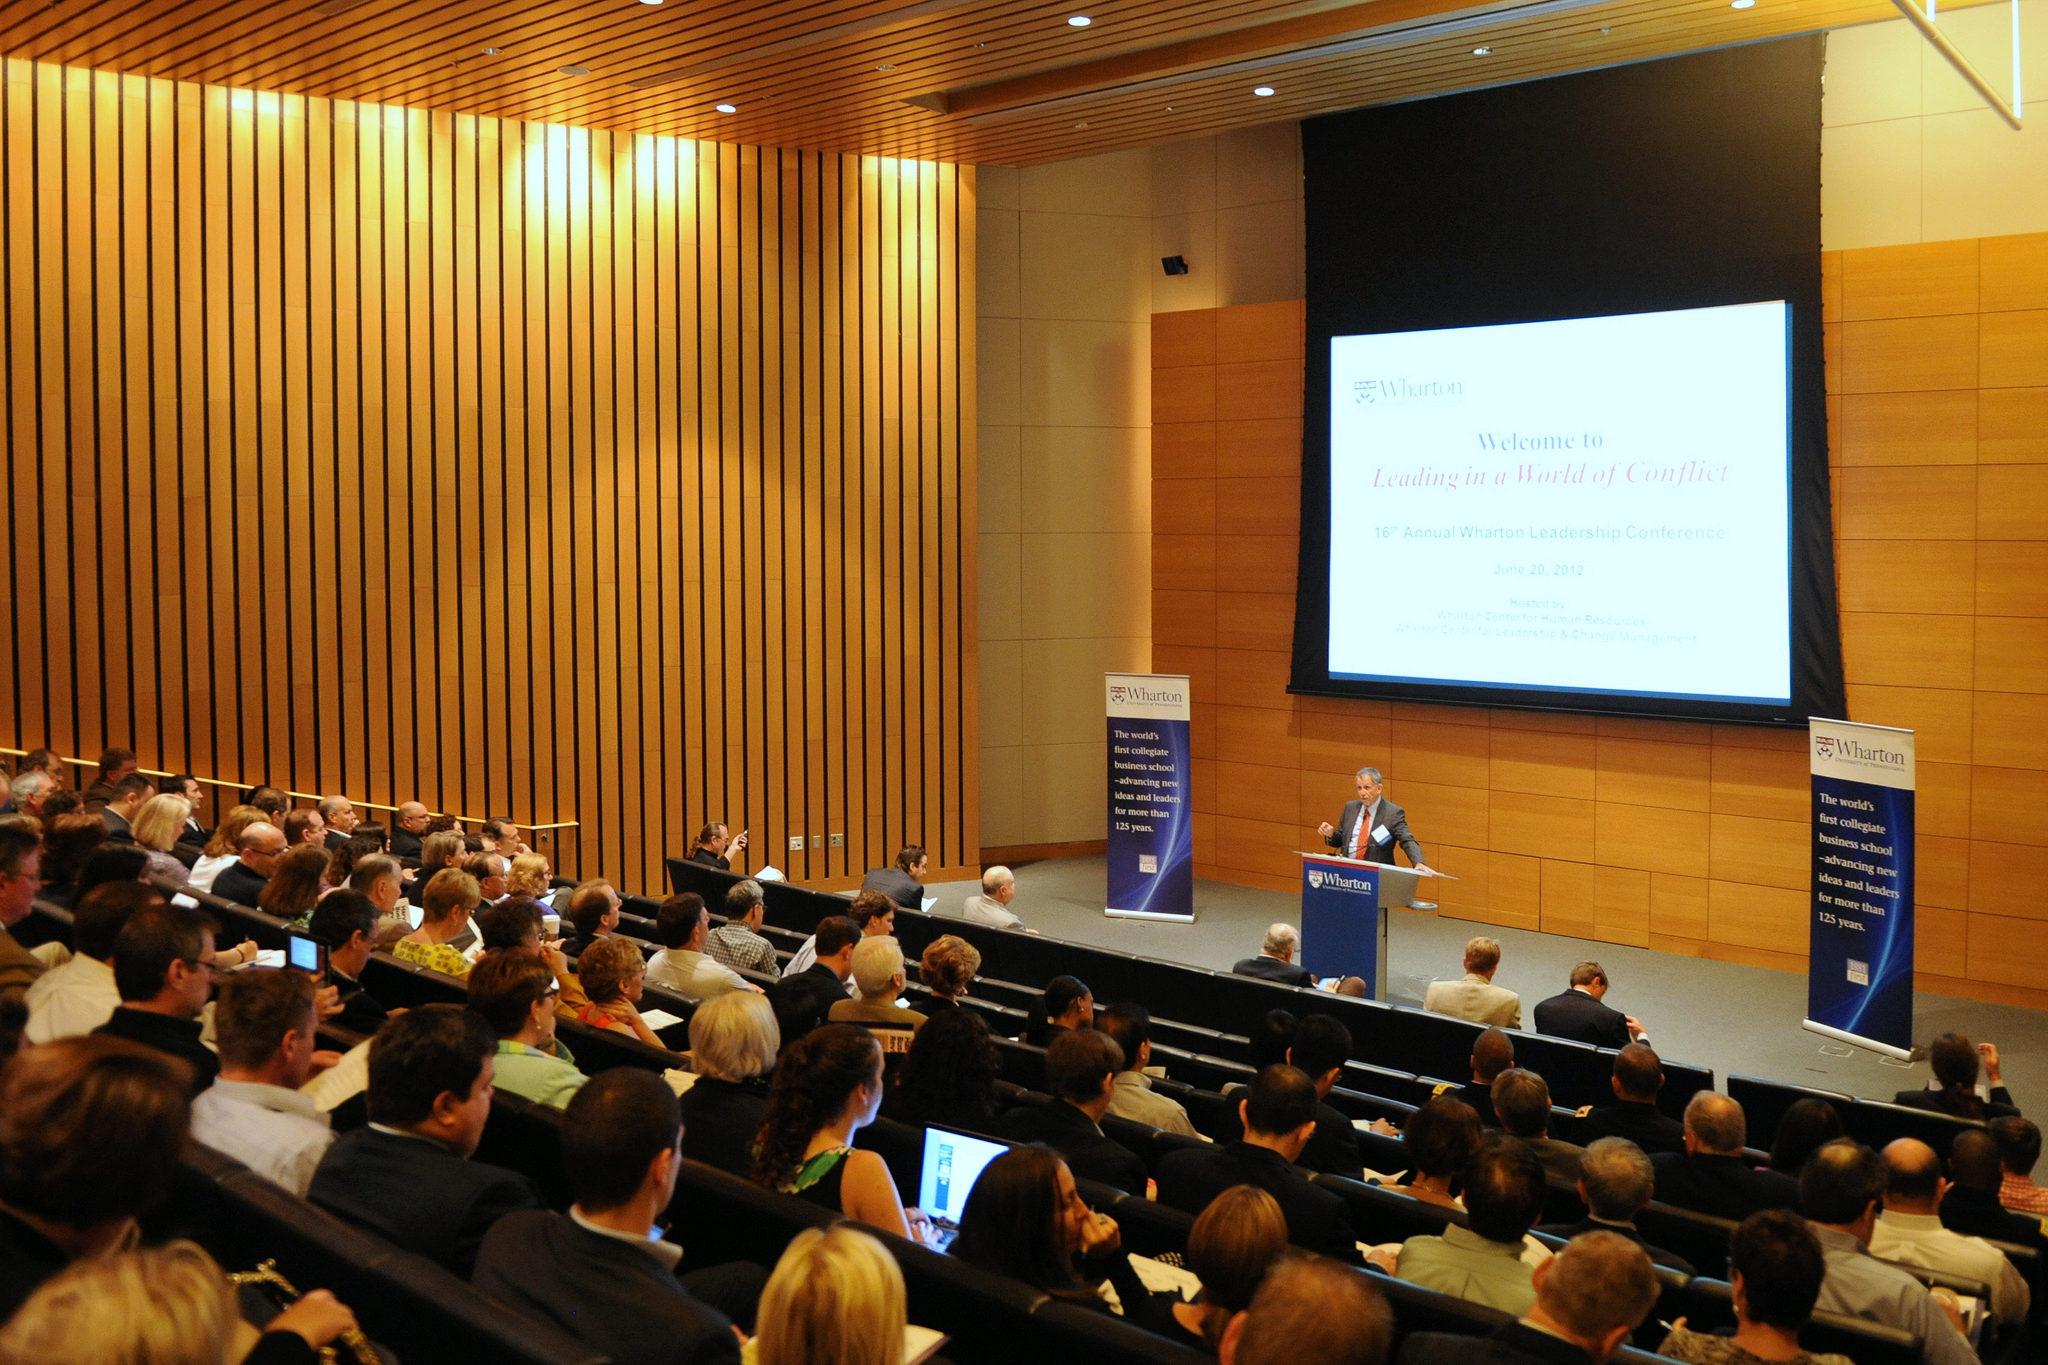 Wharton Leadership Lecture